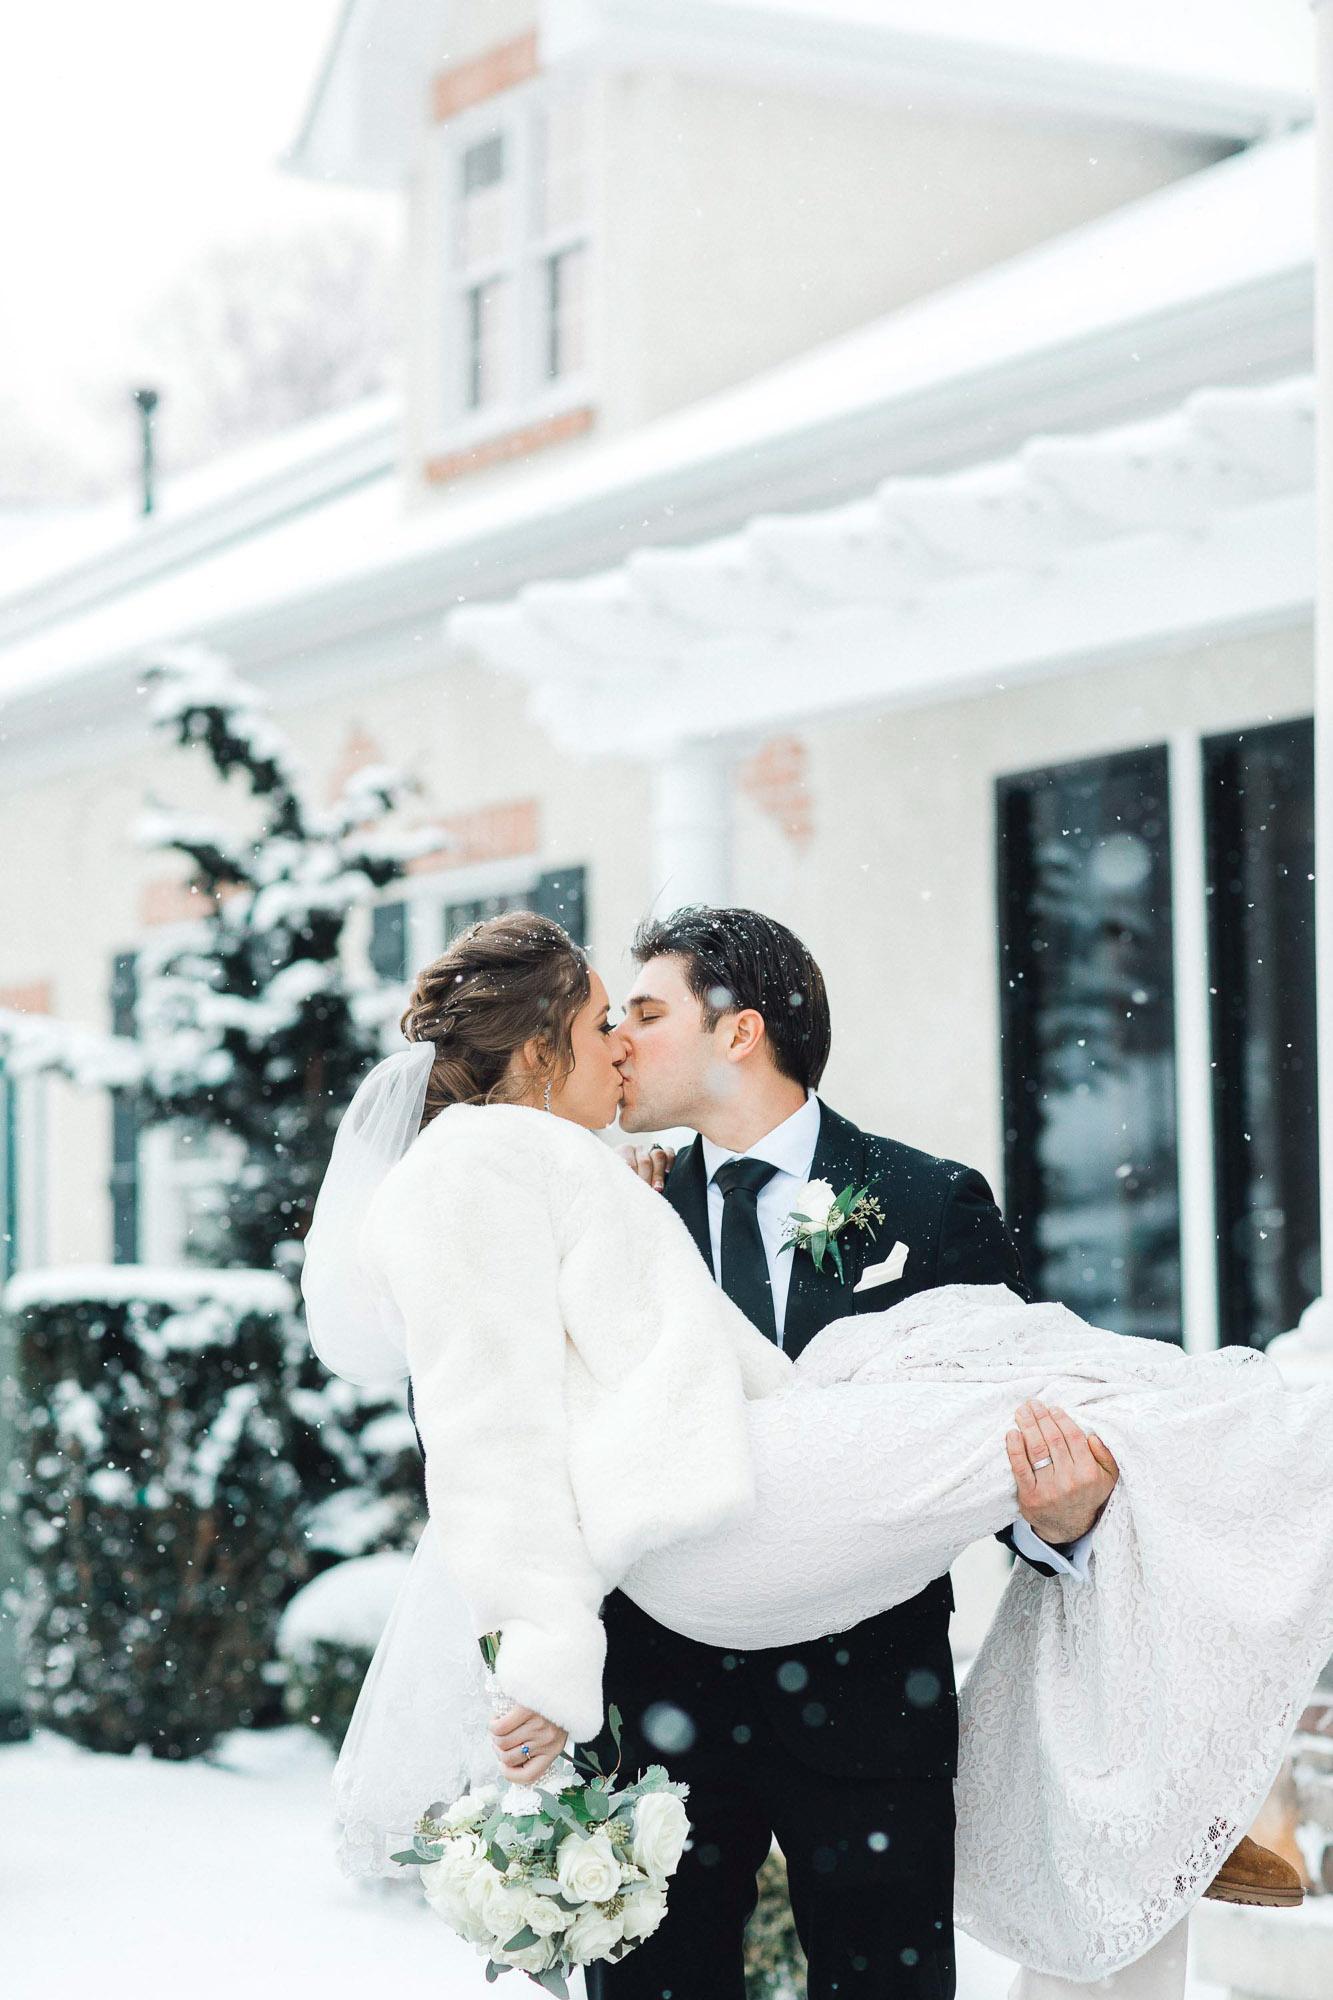 snowy-sand-springs-country-club-drums-pa-christmas-wedding-24587.jpg